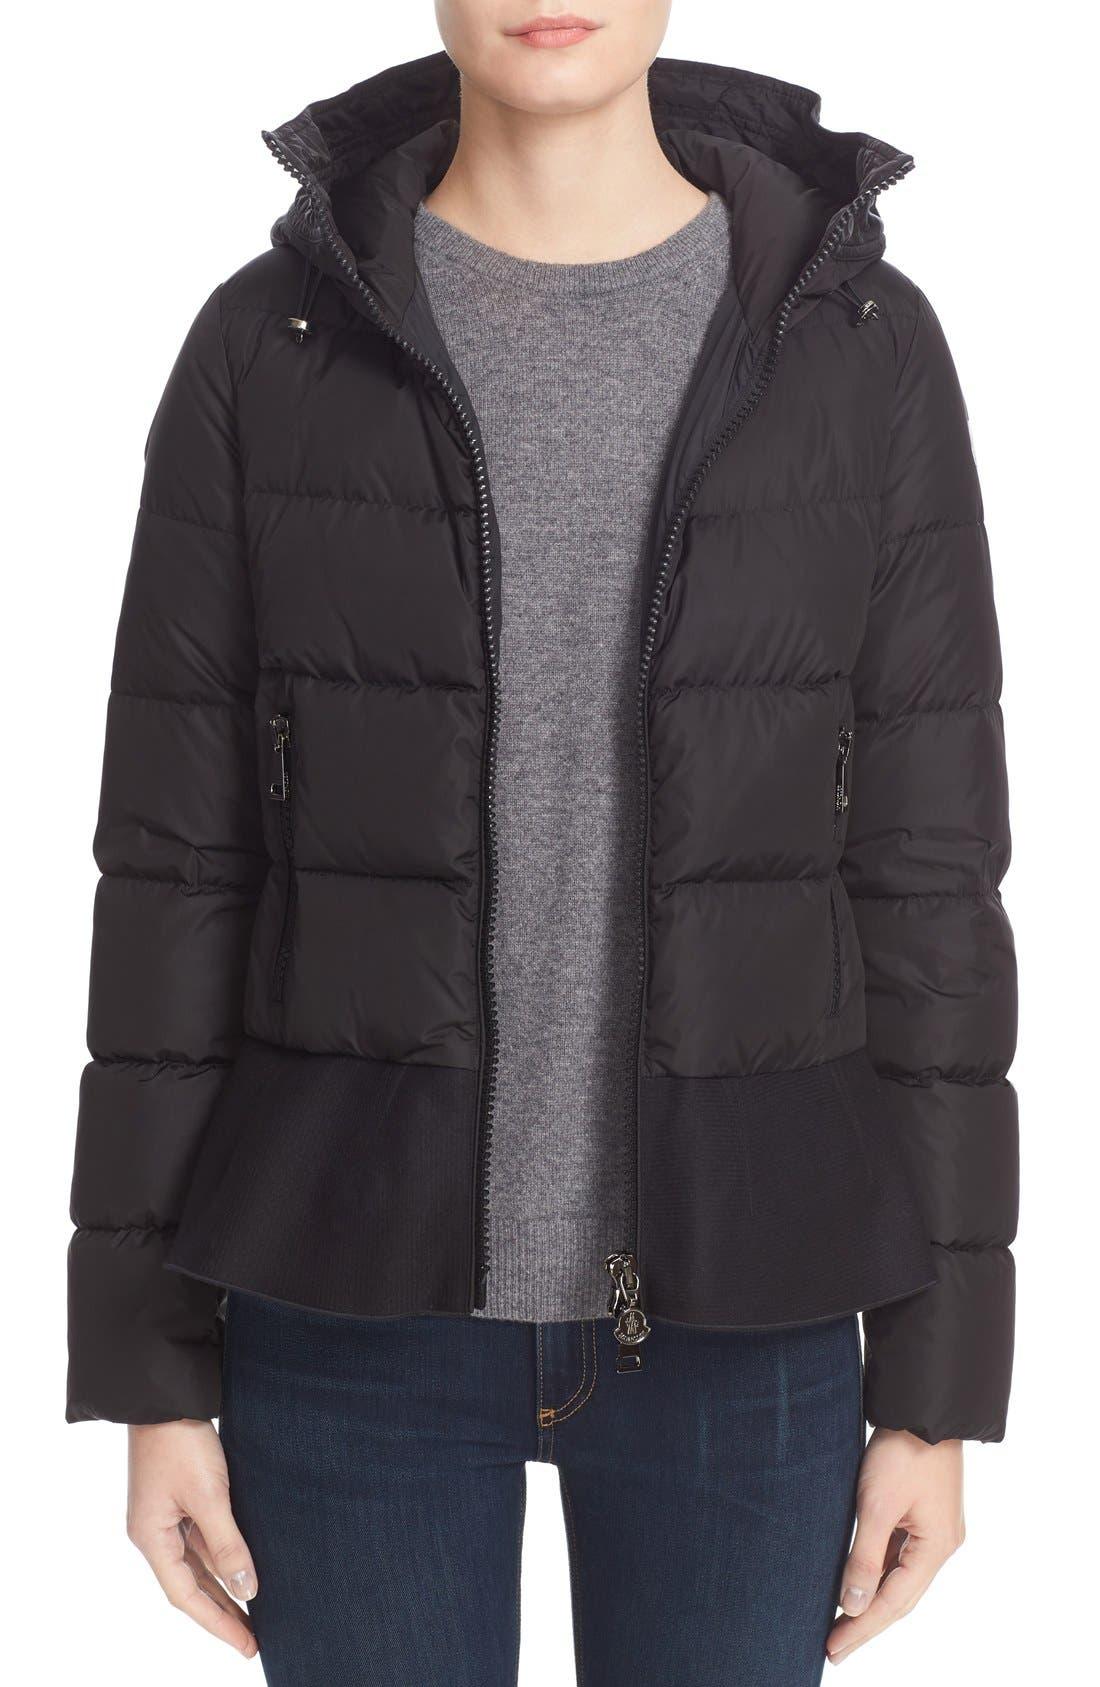 Nesea Peplum Hem Down Puffer Jacket,                         Main,                         color, Black